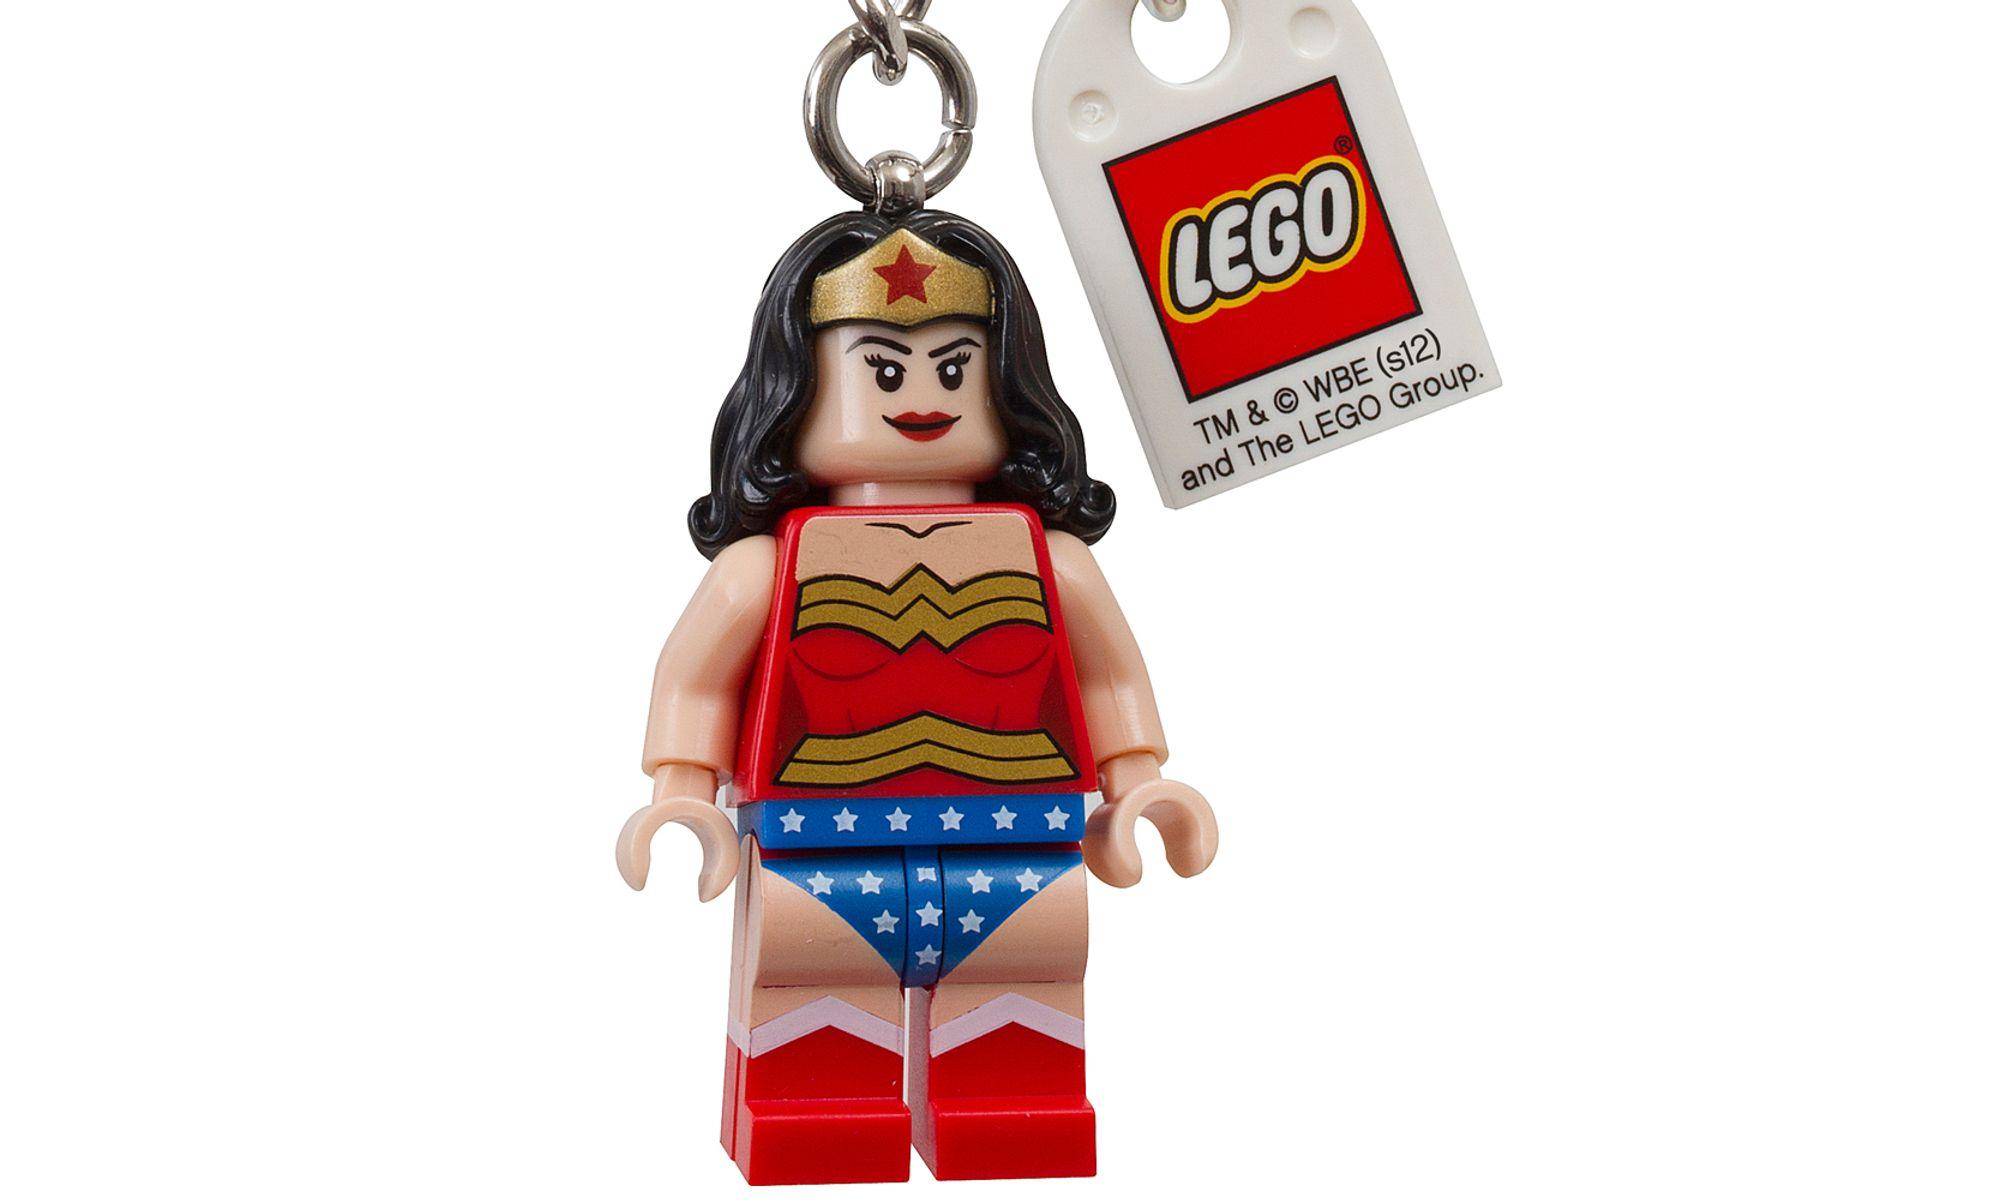 Lego Chaveiro Super Heroes Mulher Maravilha Lego